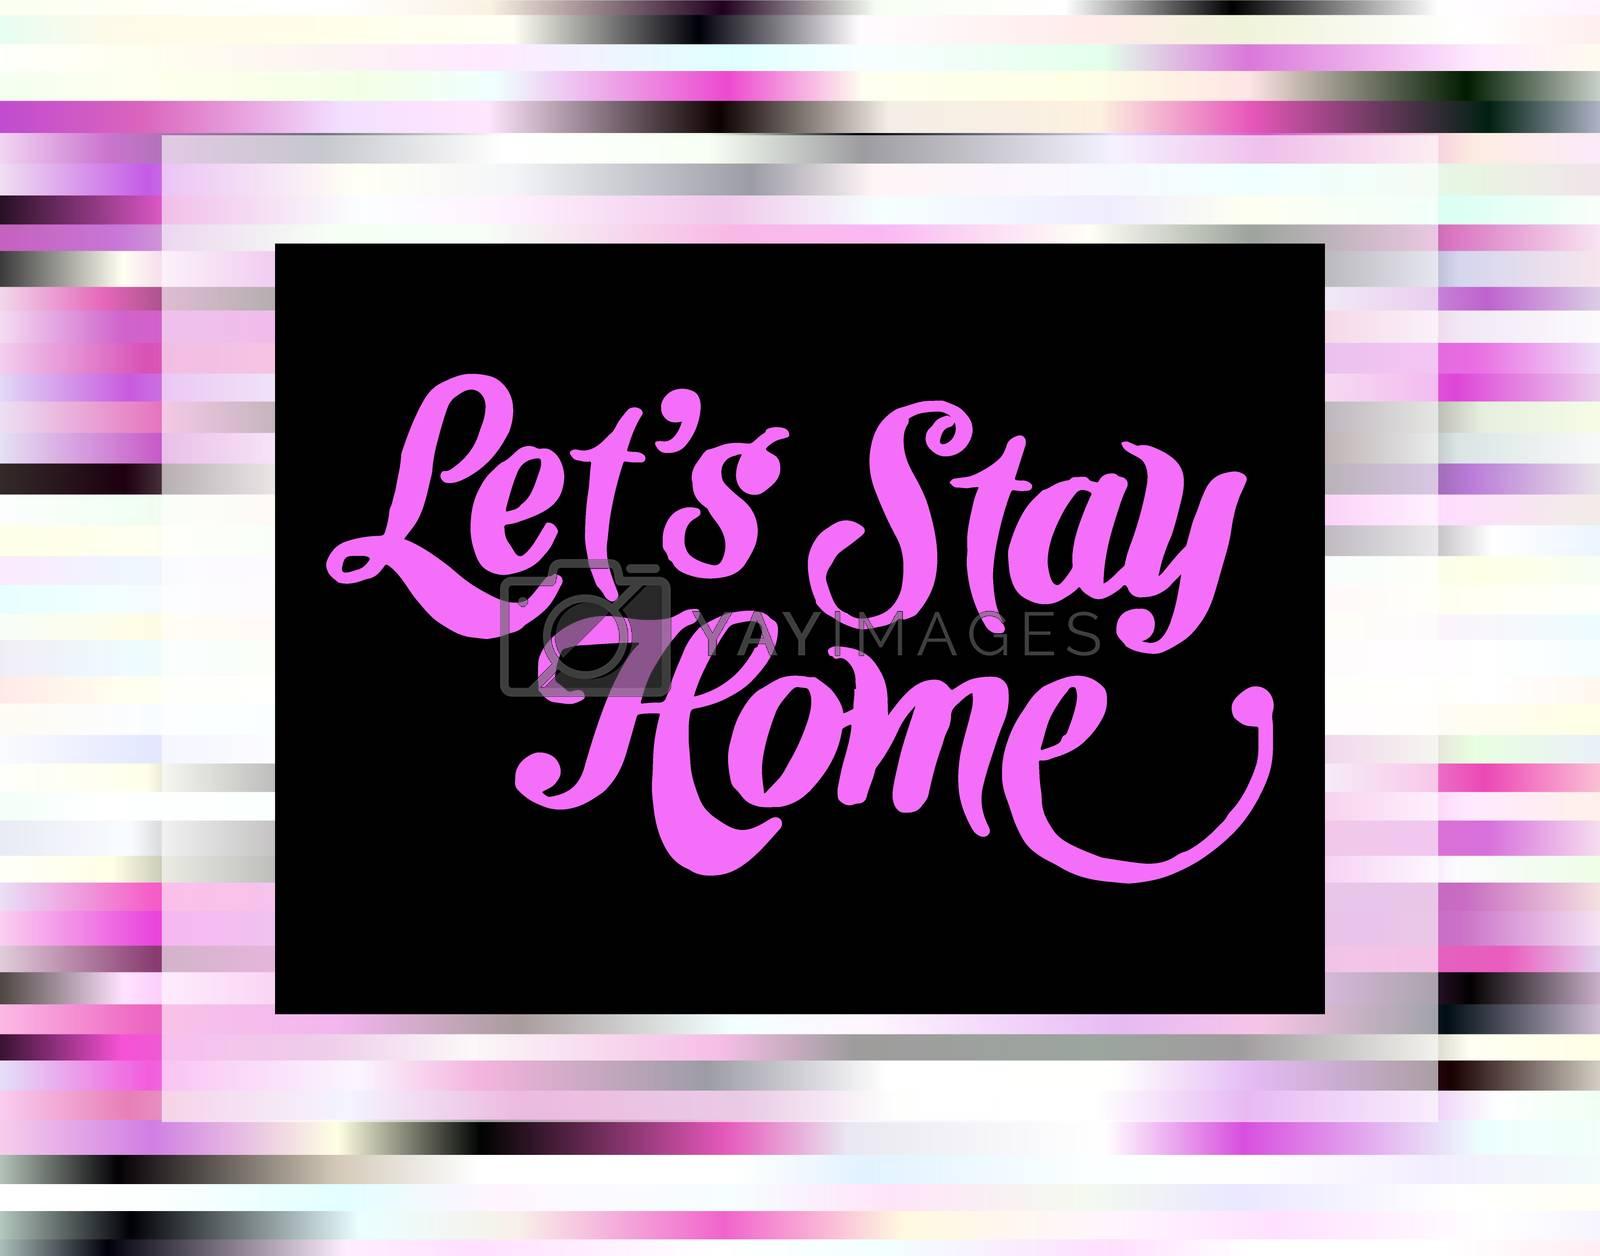 Let's stay home lettering. Magenta and black stripes frame